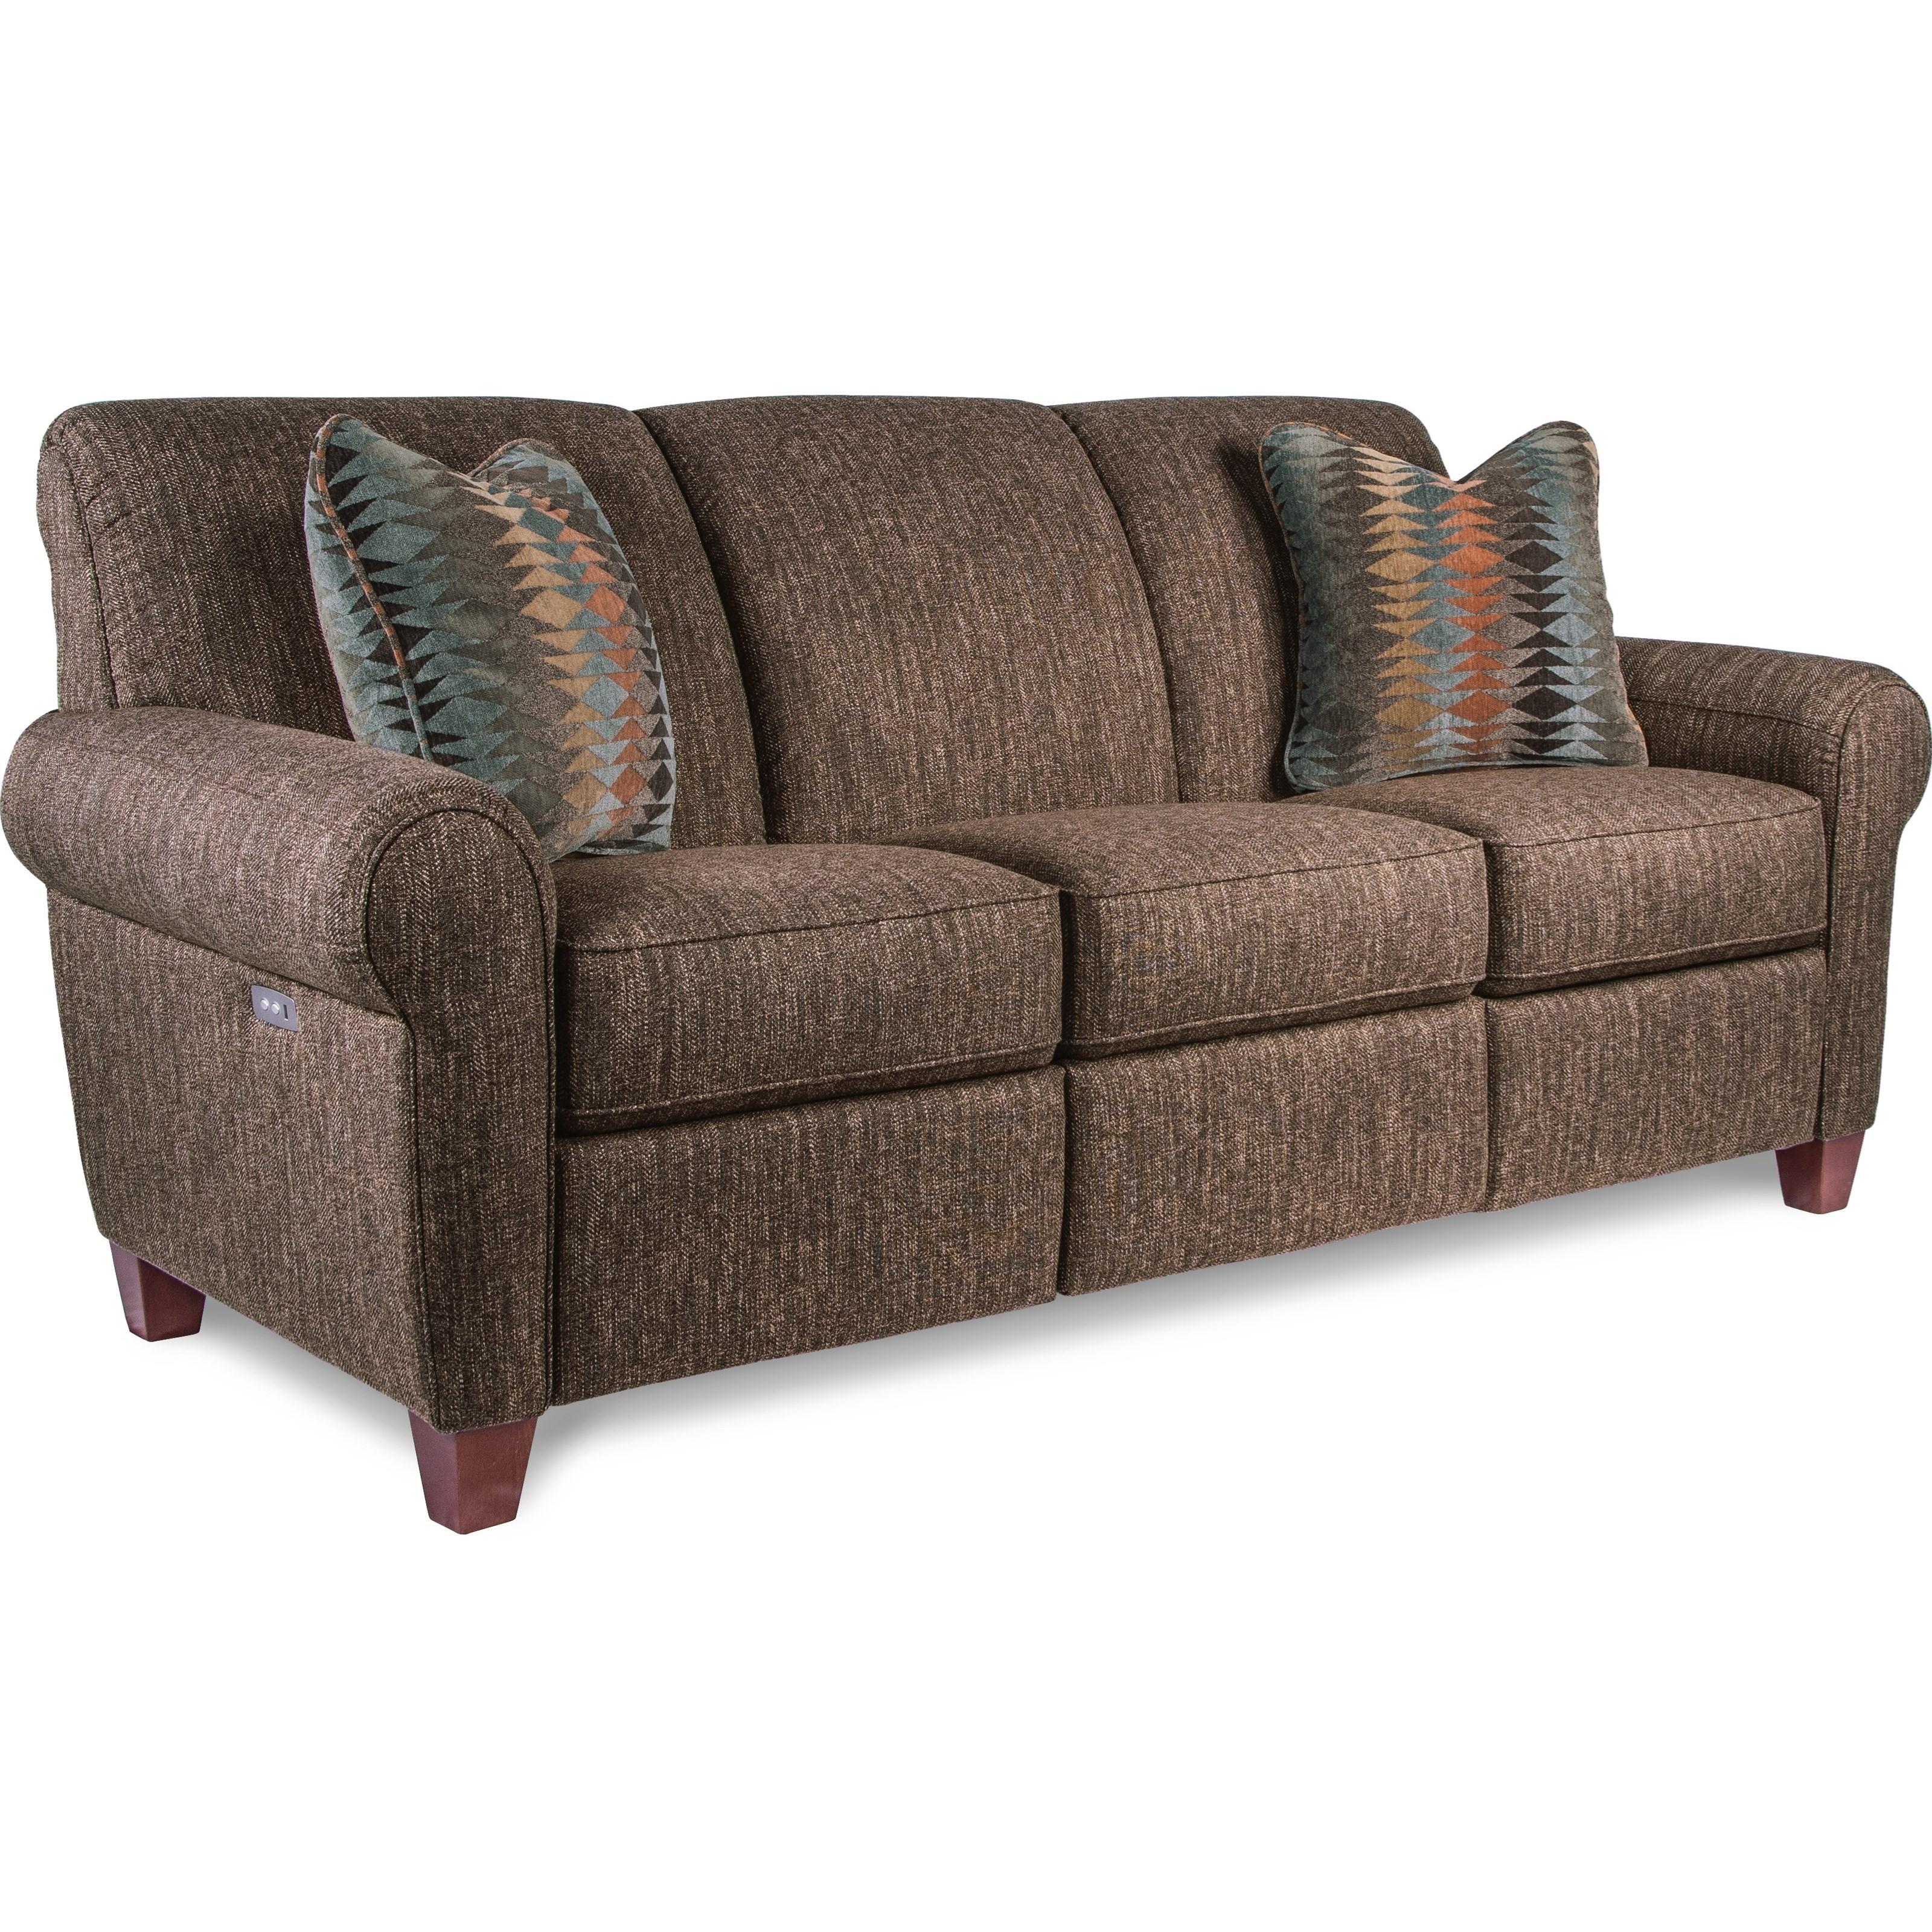 Bennett Duo™Reclining Sofa by La-Z-Boy at Godby Home Furnishings